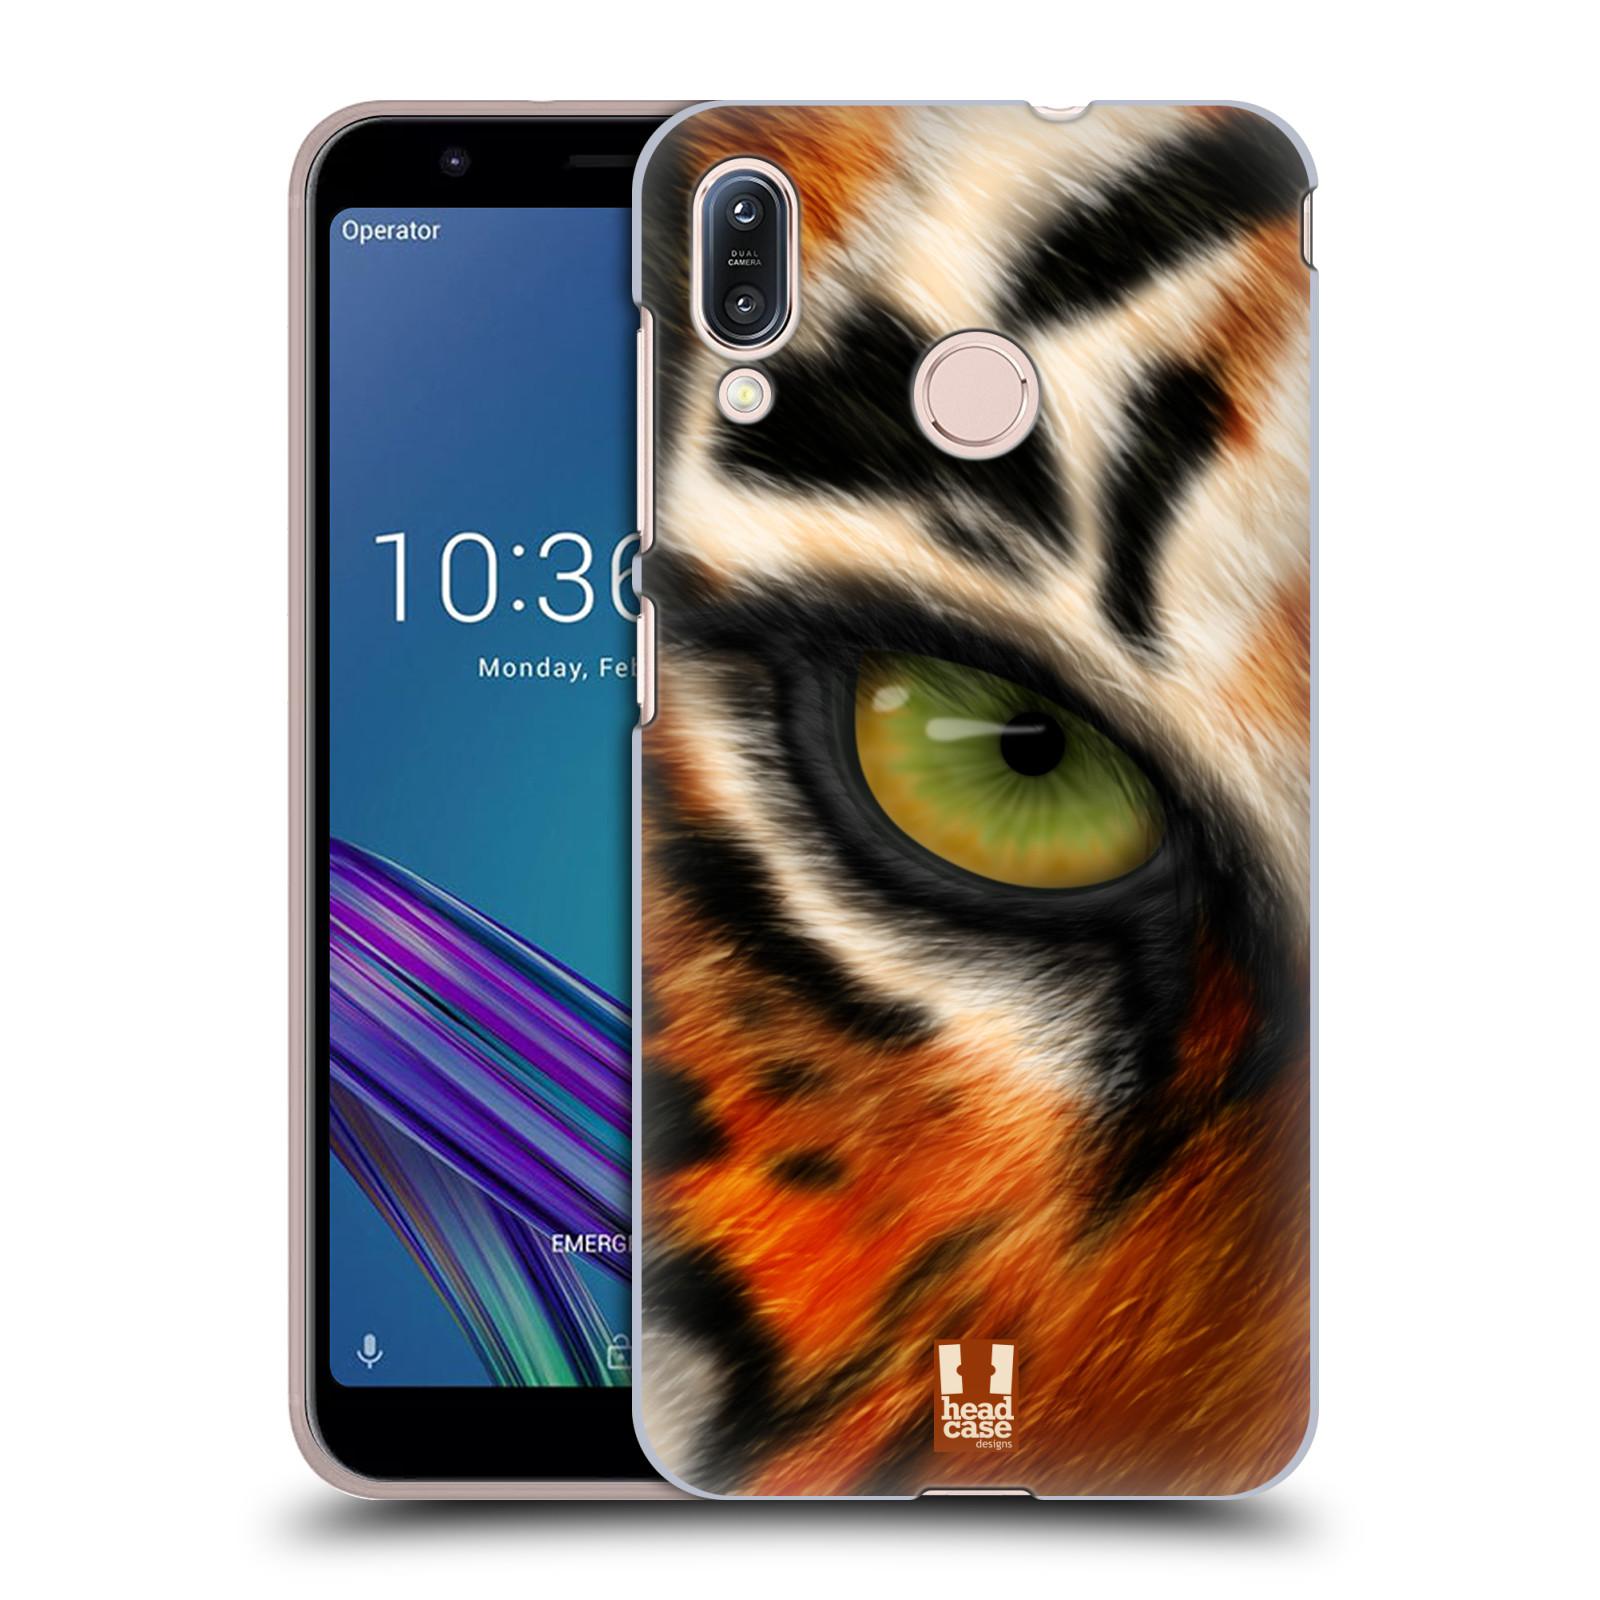 Pouzdro na mobil Asus Zenfone Max M1 (ZB555KL) - HEAD CASE - vzor pohled zvířete oko tygr